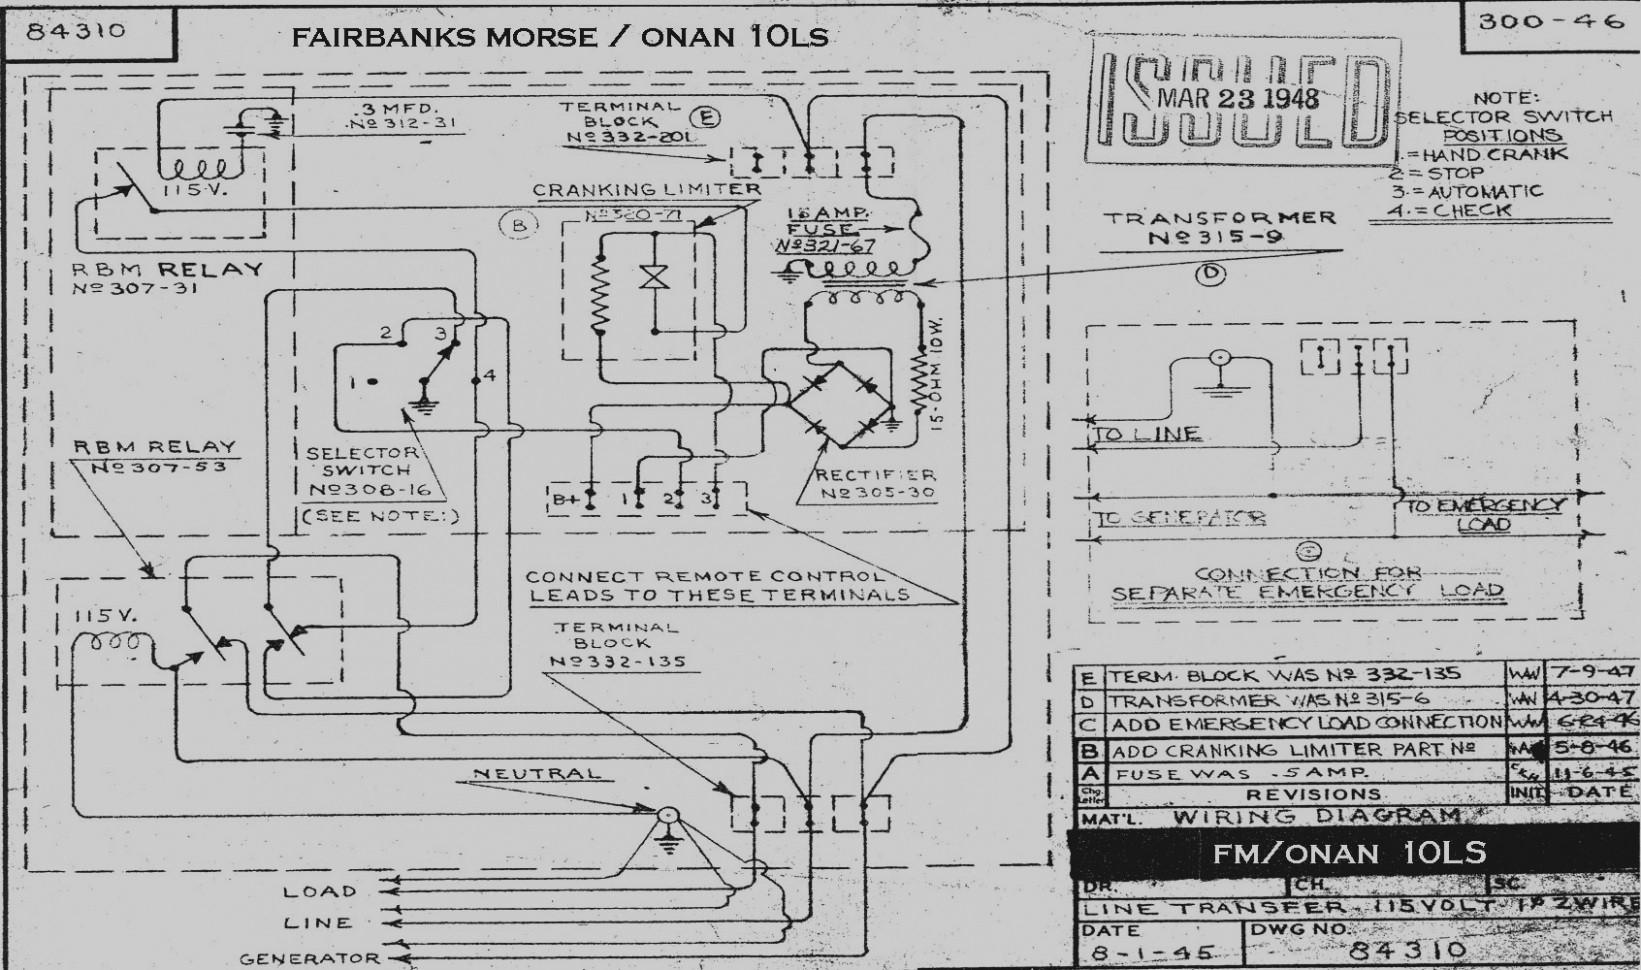 wiring diagram onan genset home dsl schematic 4000 generator parts all data p220